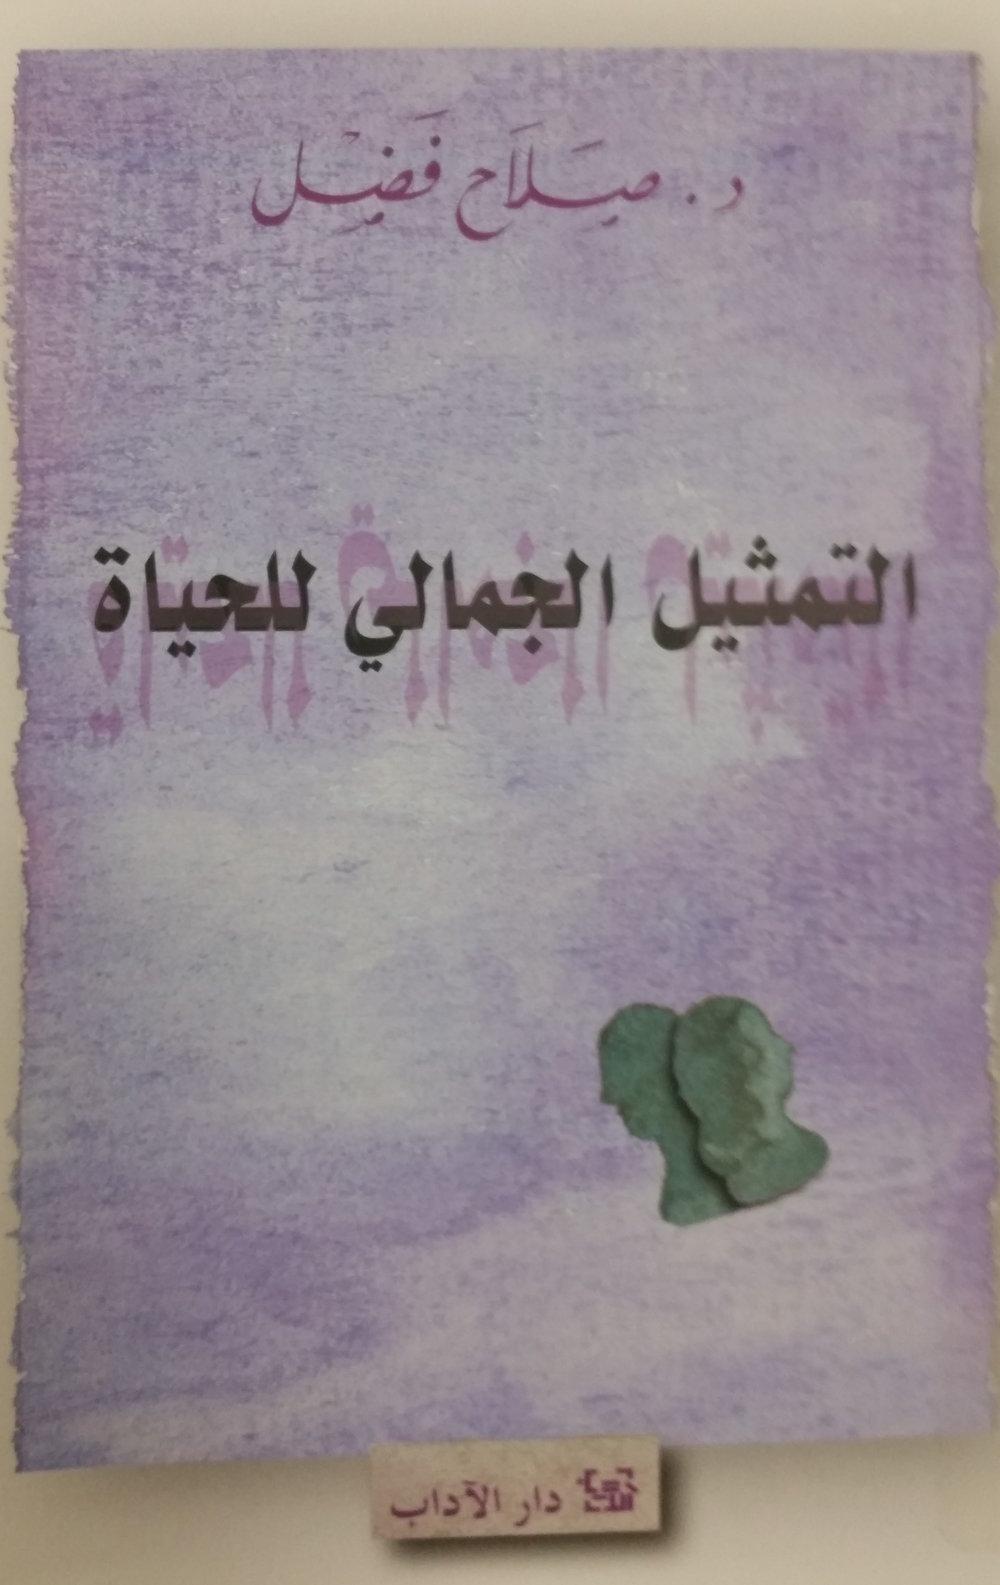 Ṣalāḥ Faḍl (Bayrūt : Dār al-Ādāb, 2009).